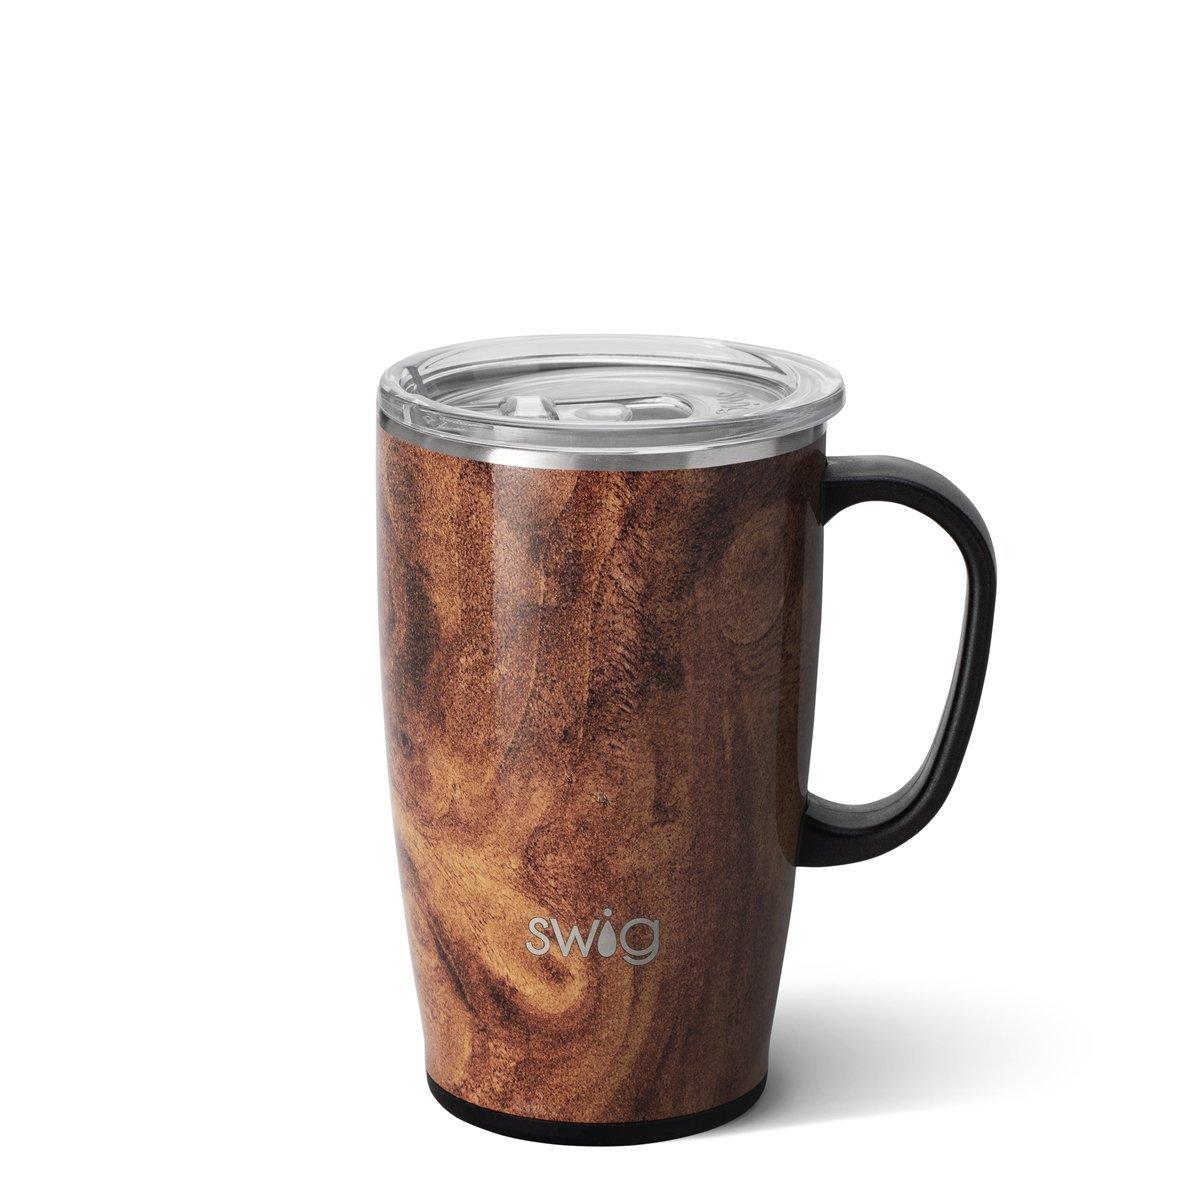 Swig Brown Swirl 18oz Travel Mug